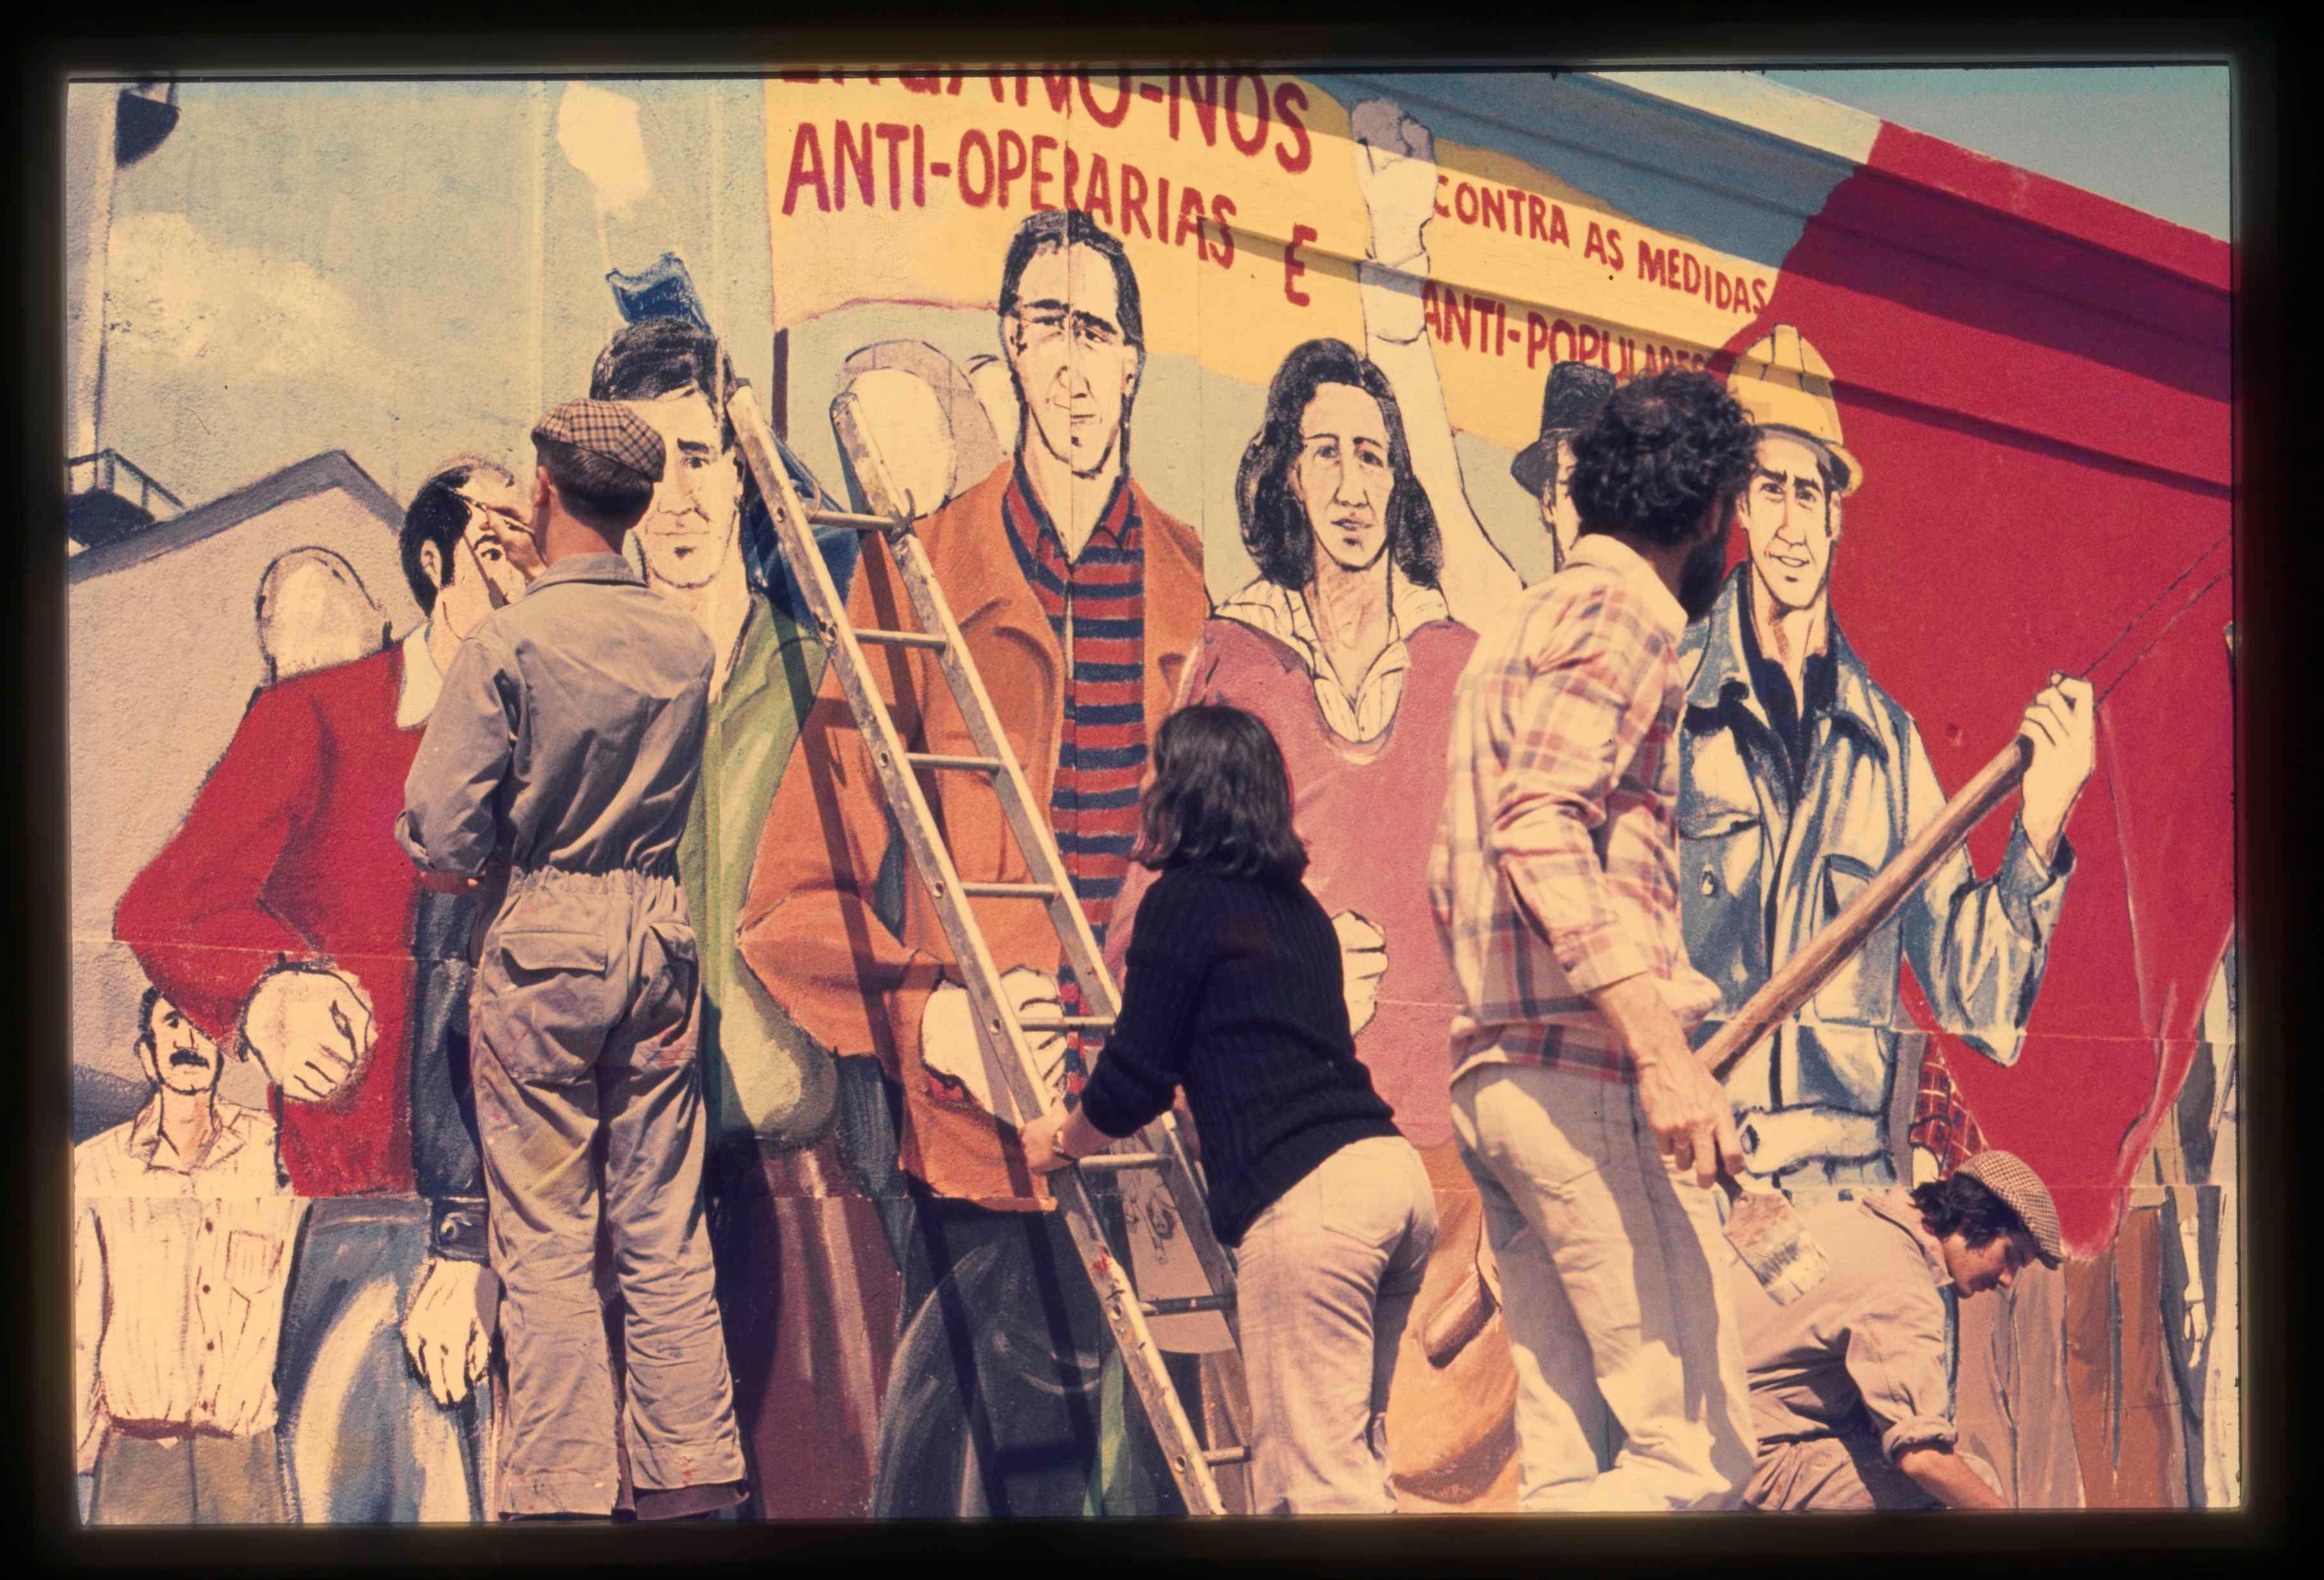 May 1st commemorative mural in Alcântara Mar